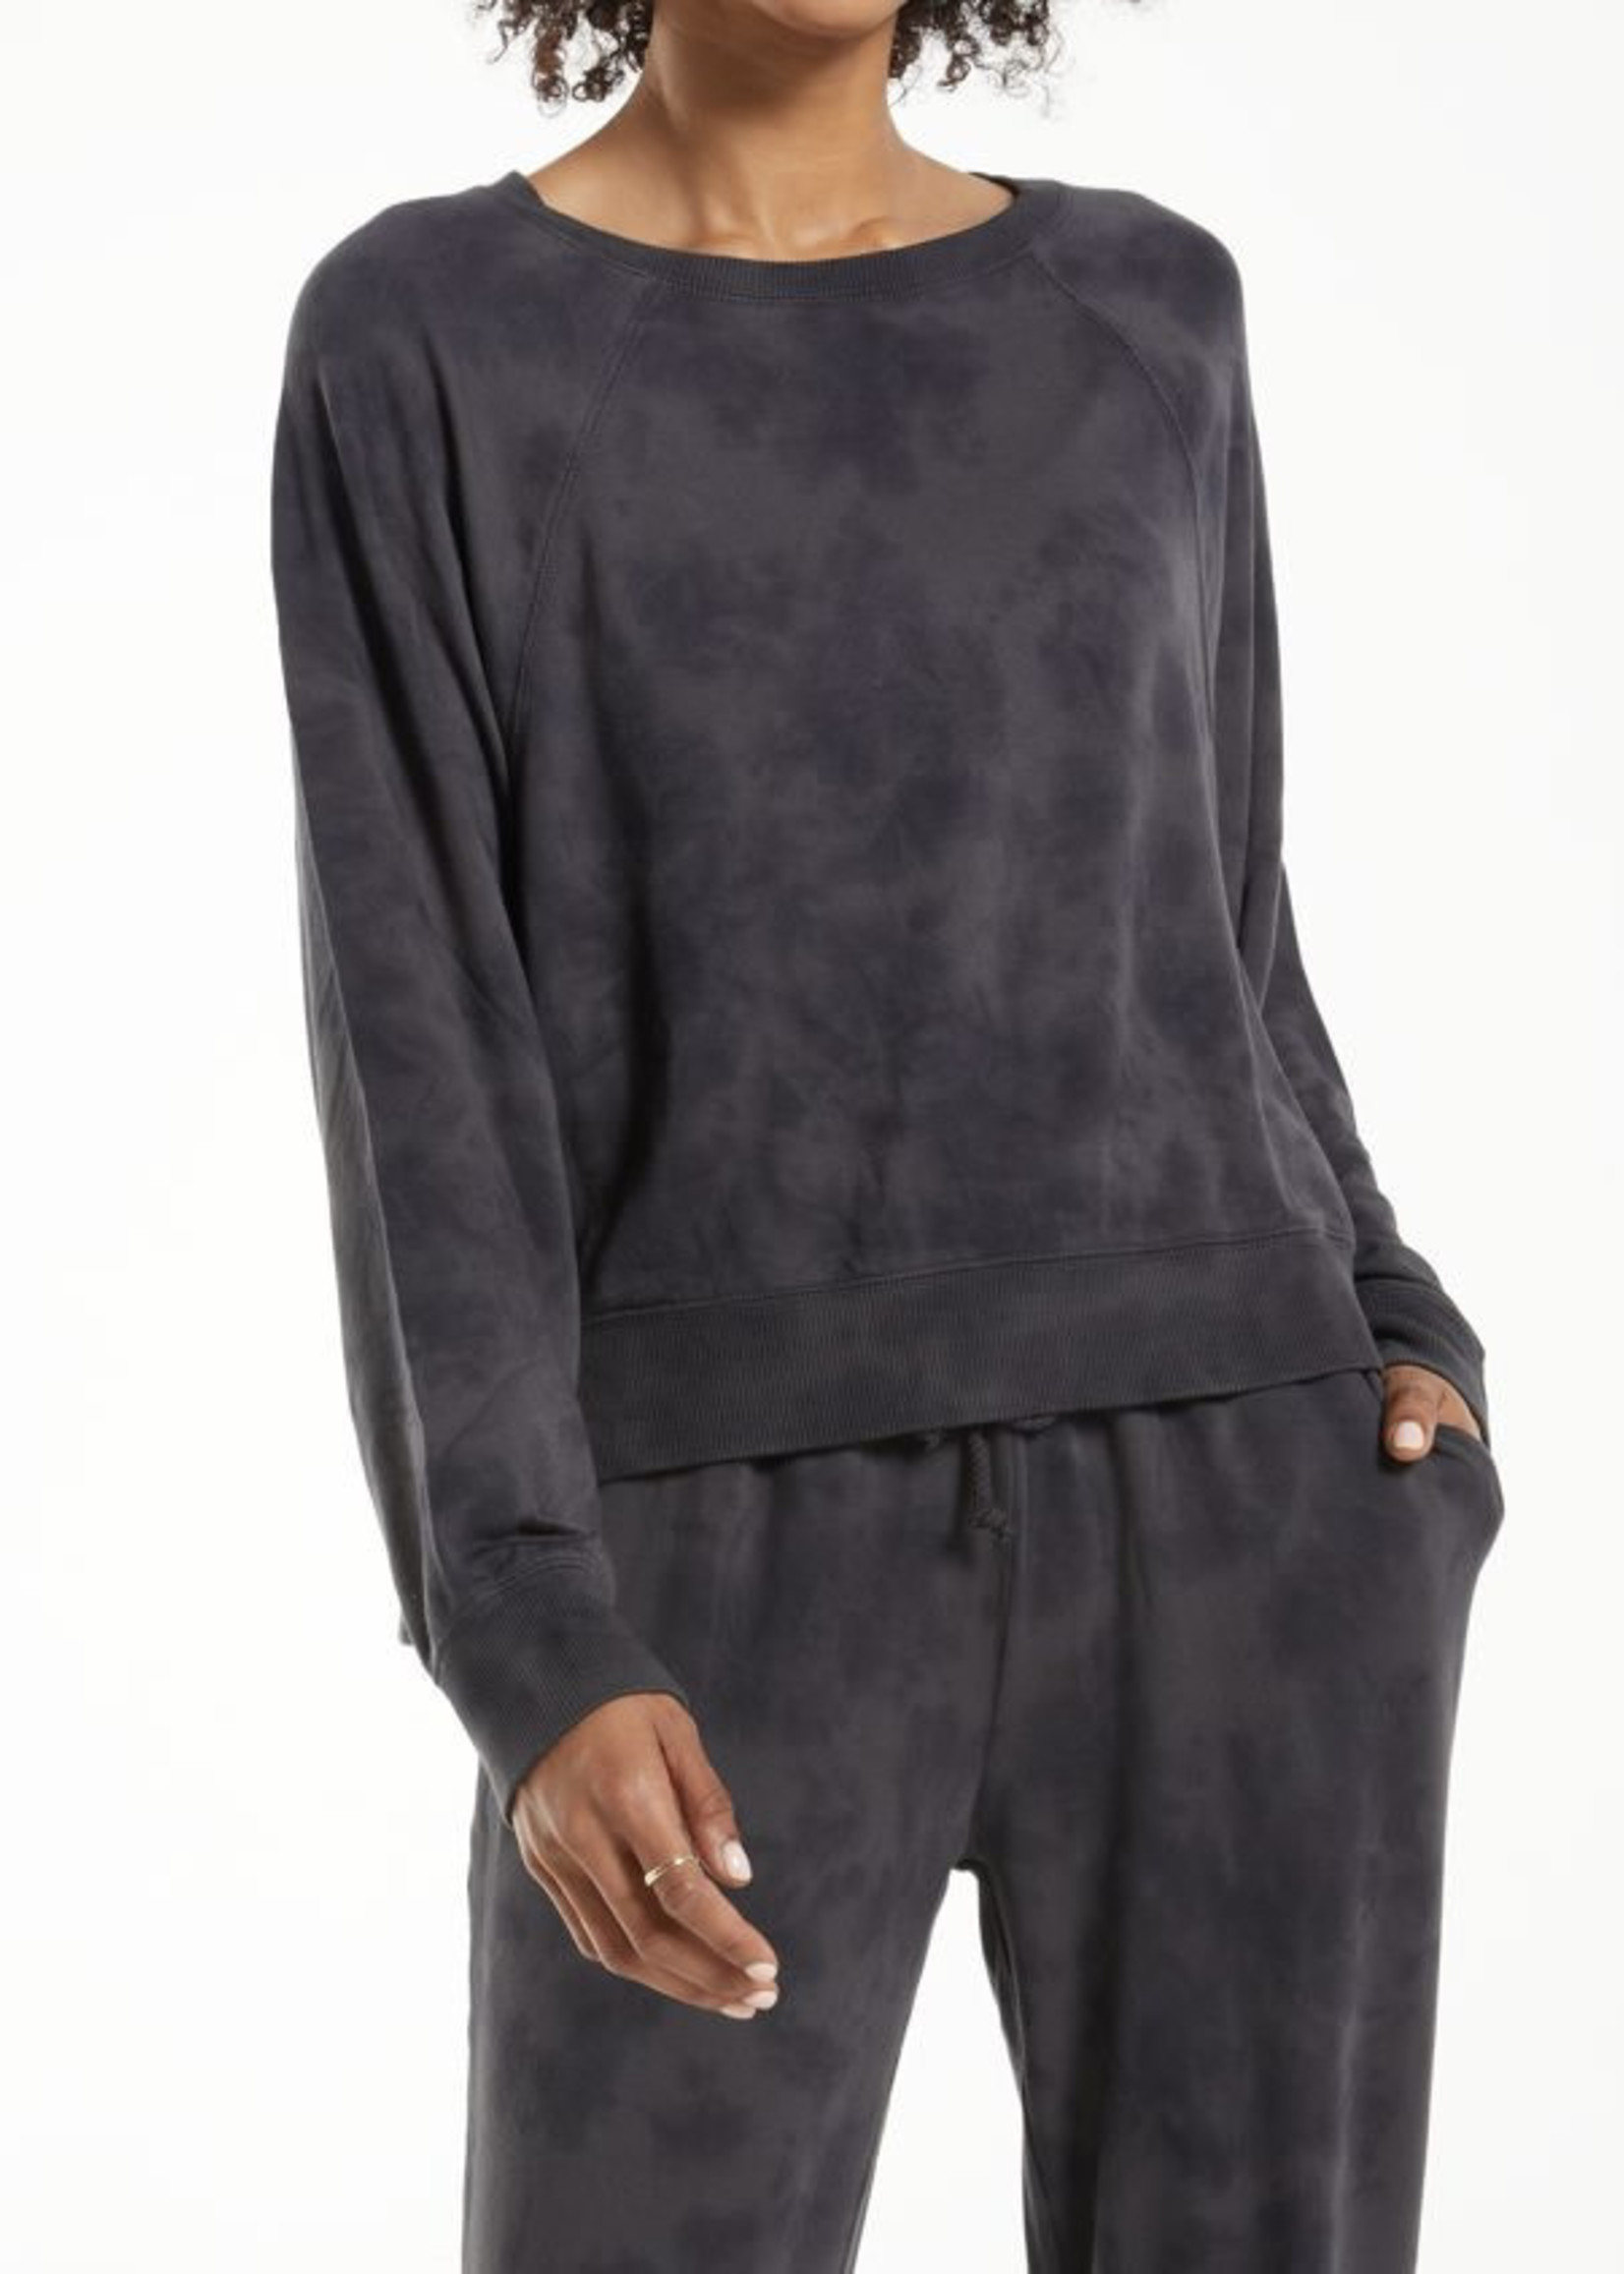 Z Supply ZS - Sleep Over Tie-Dye Sweatshirt